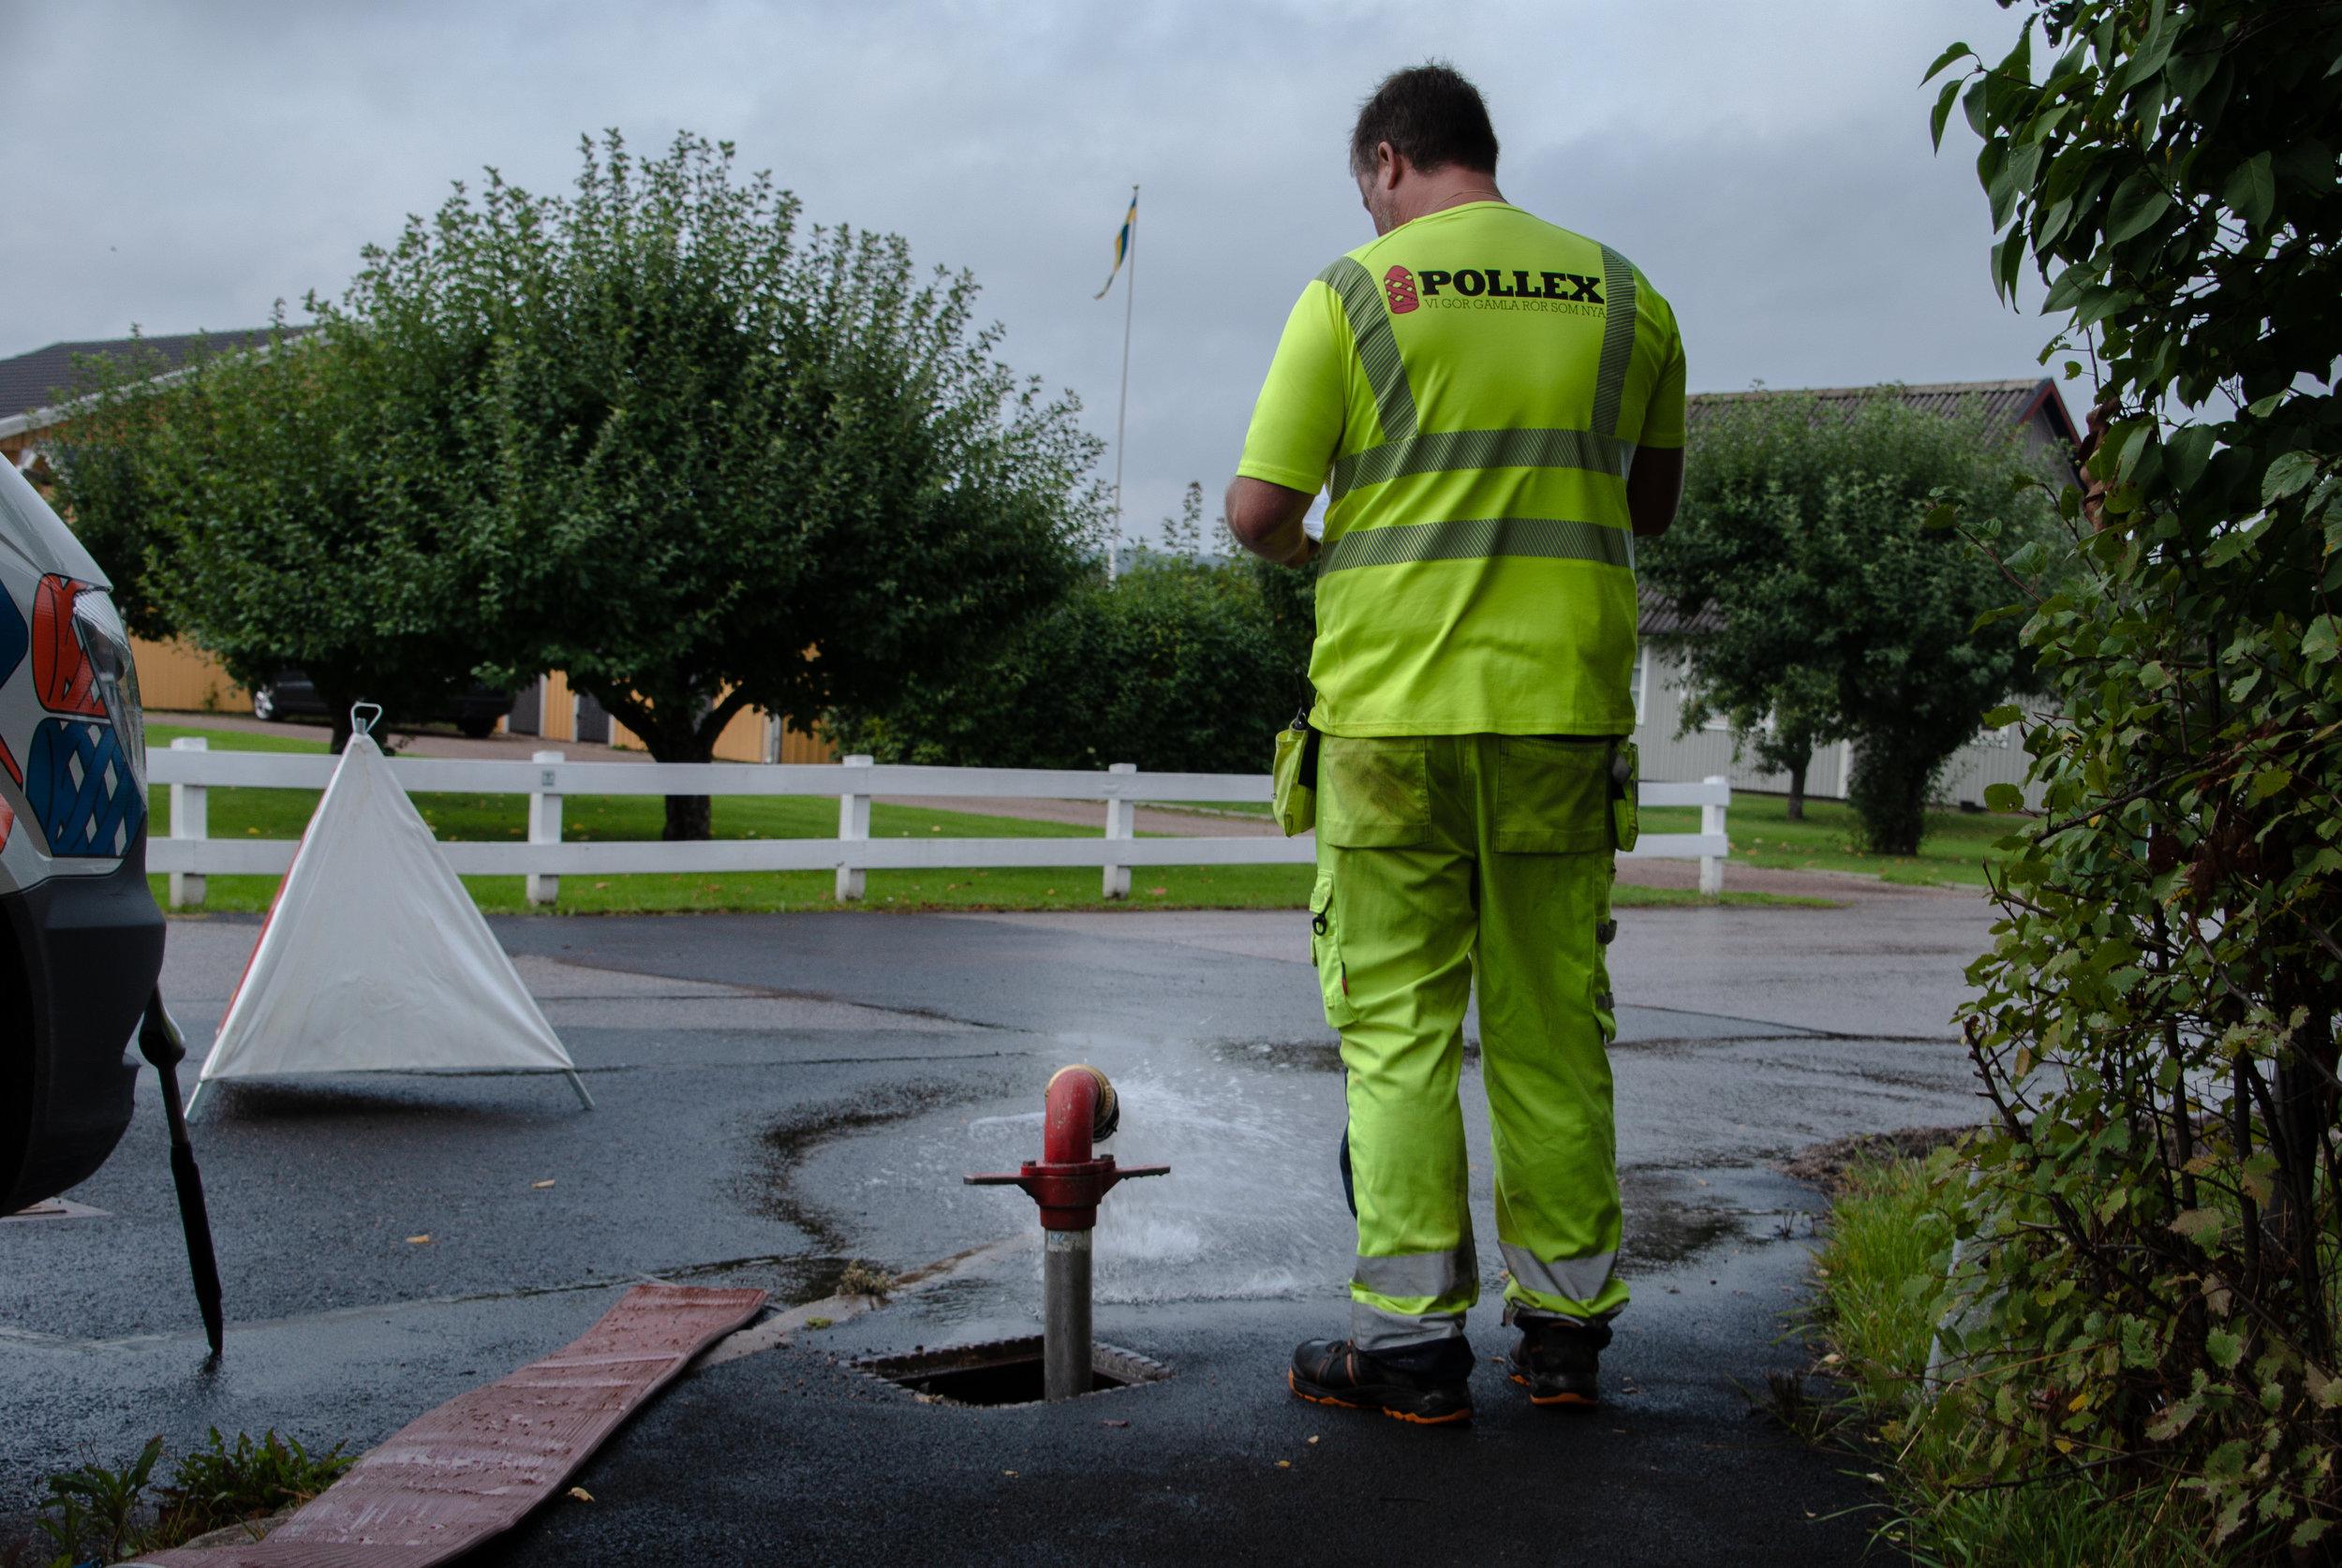 pollex-vatten-dricksvatten-luftvattenspolning.jpg